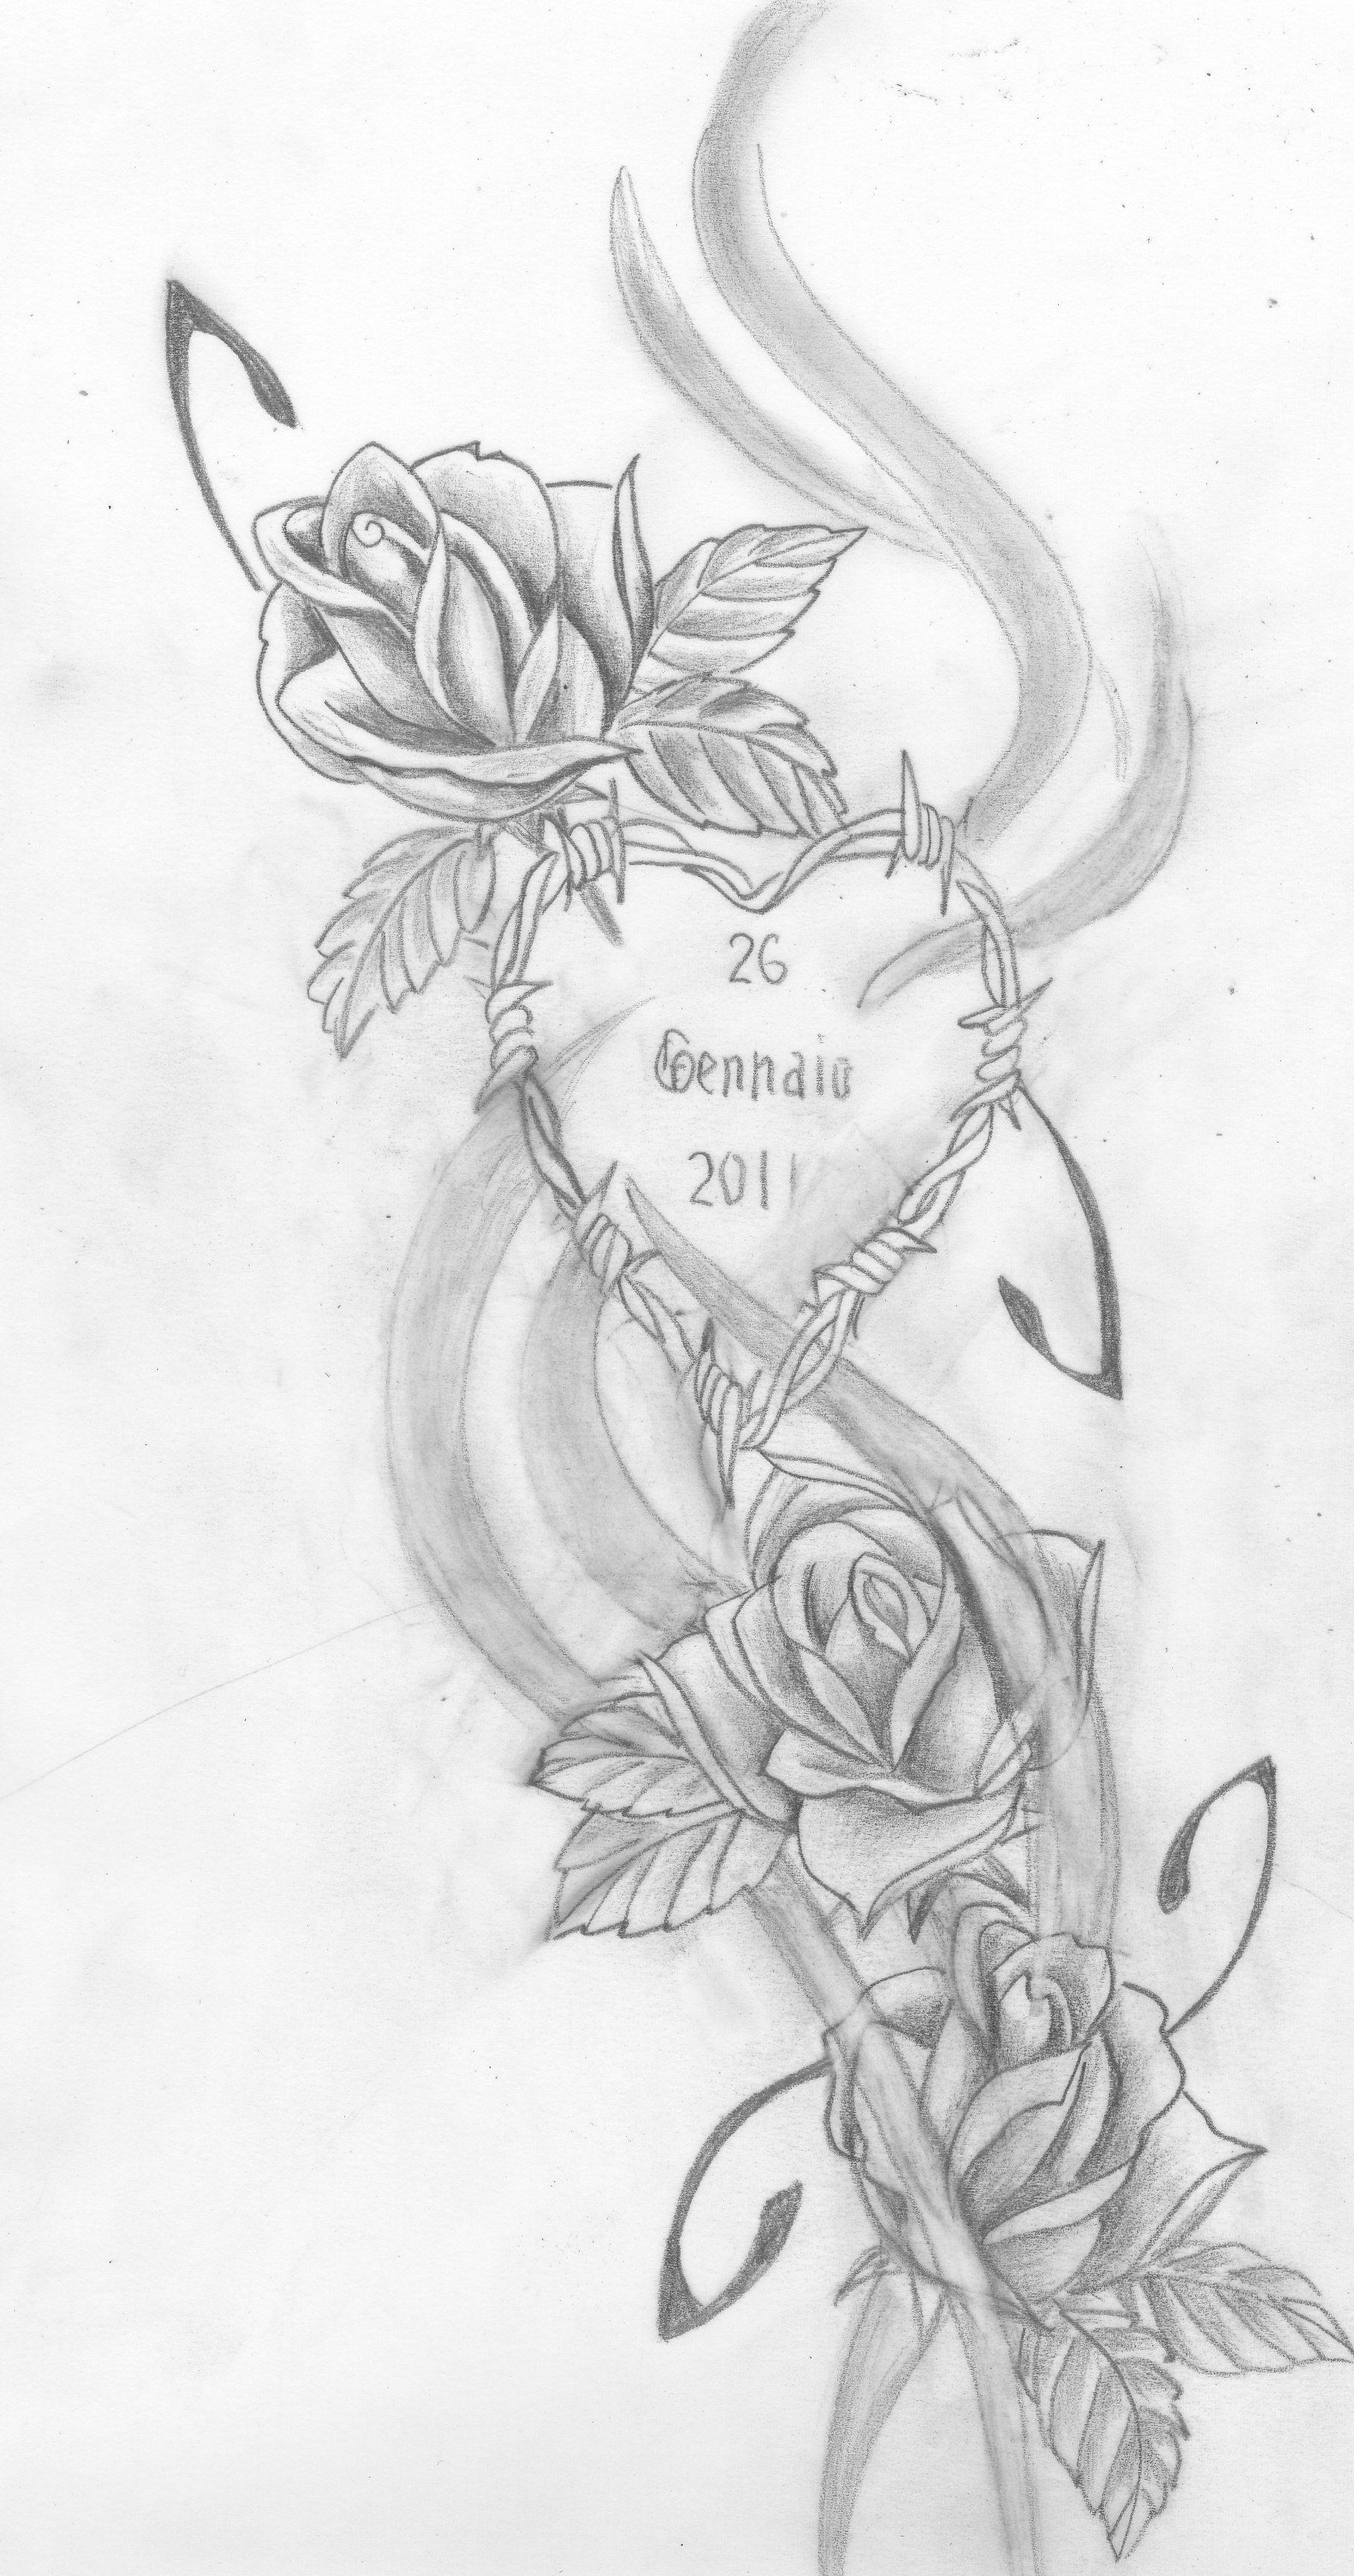 Bozza Tattoo Rose Roses Drawing Rose Tattoos Family Tattoo Designs